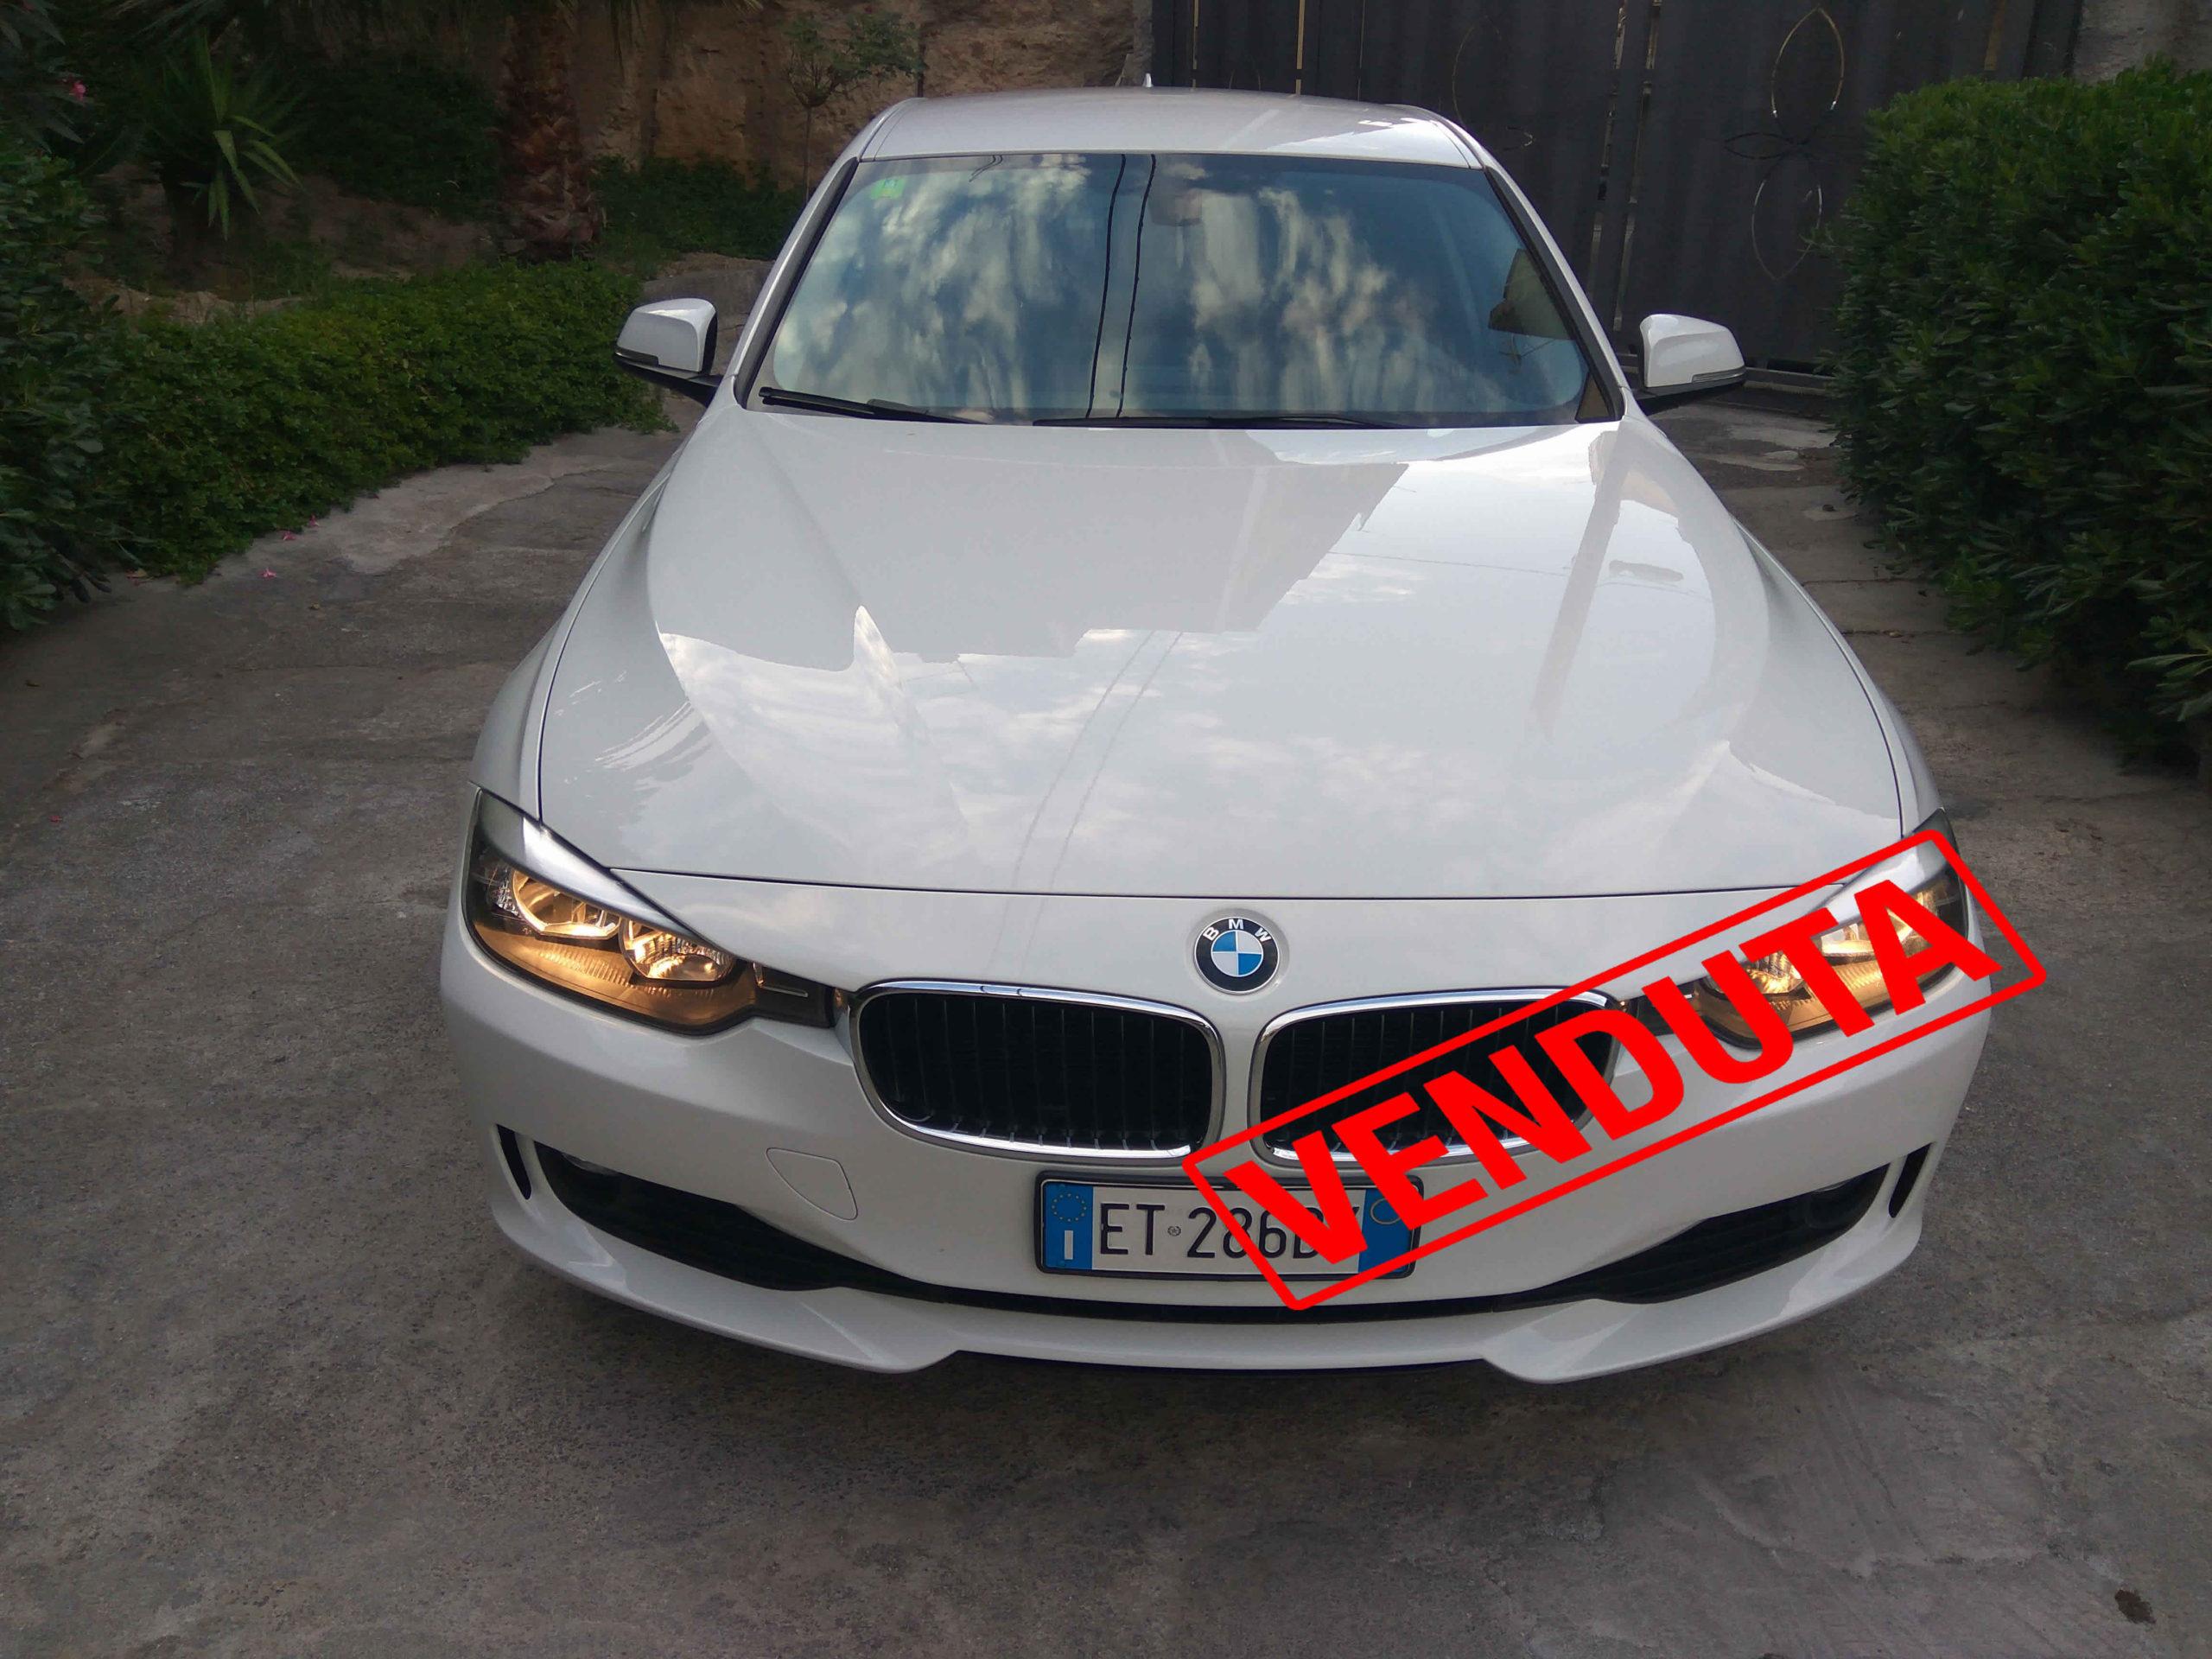 BMW 320d 163CV - €12.500